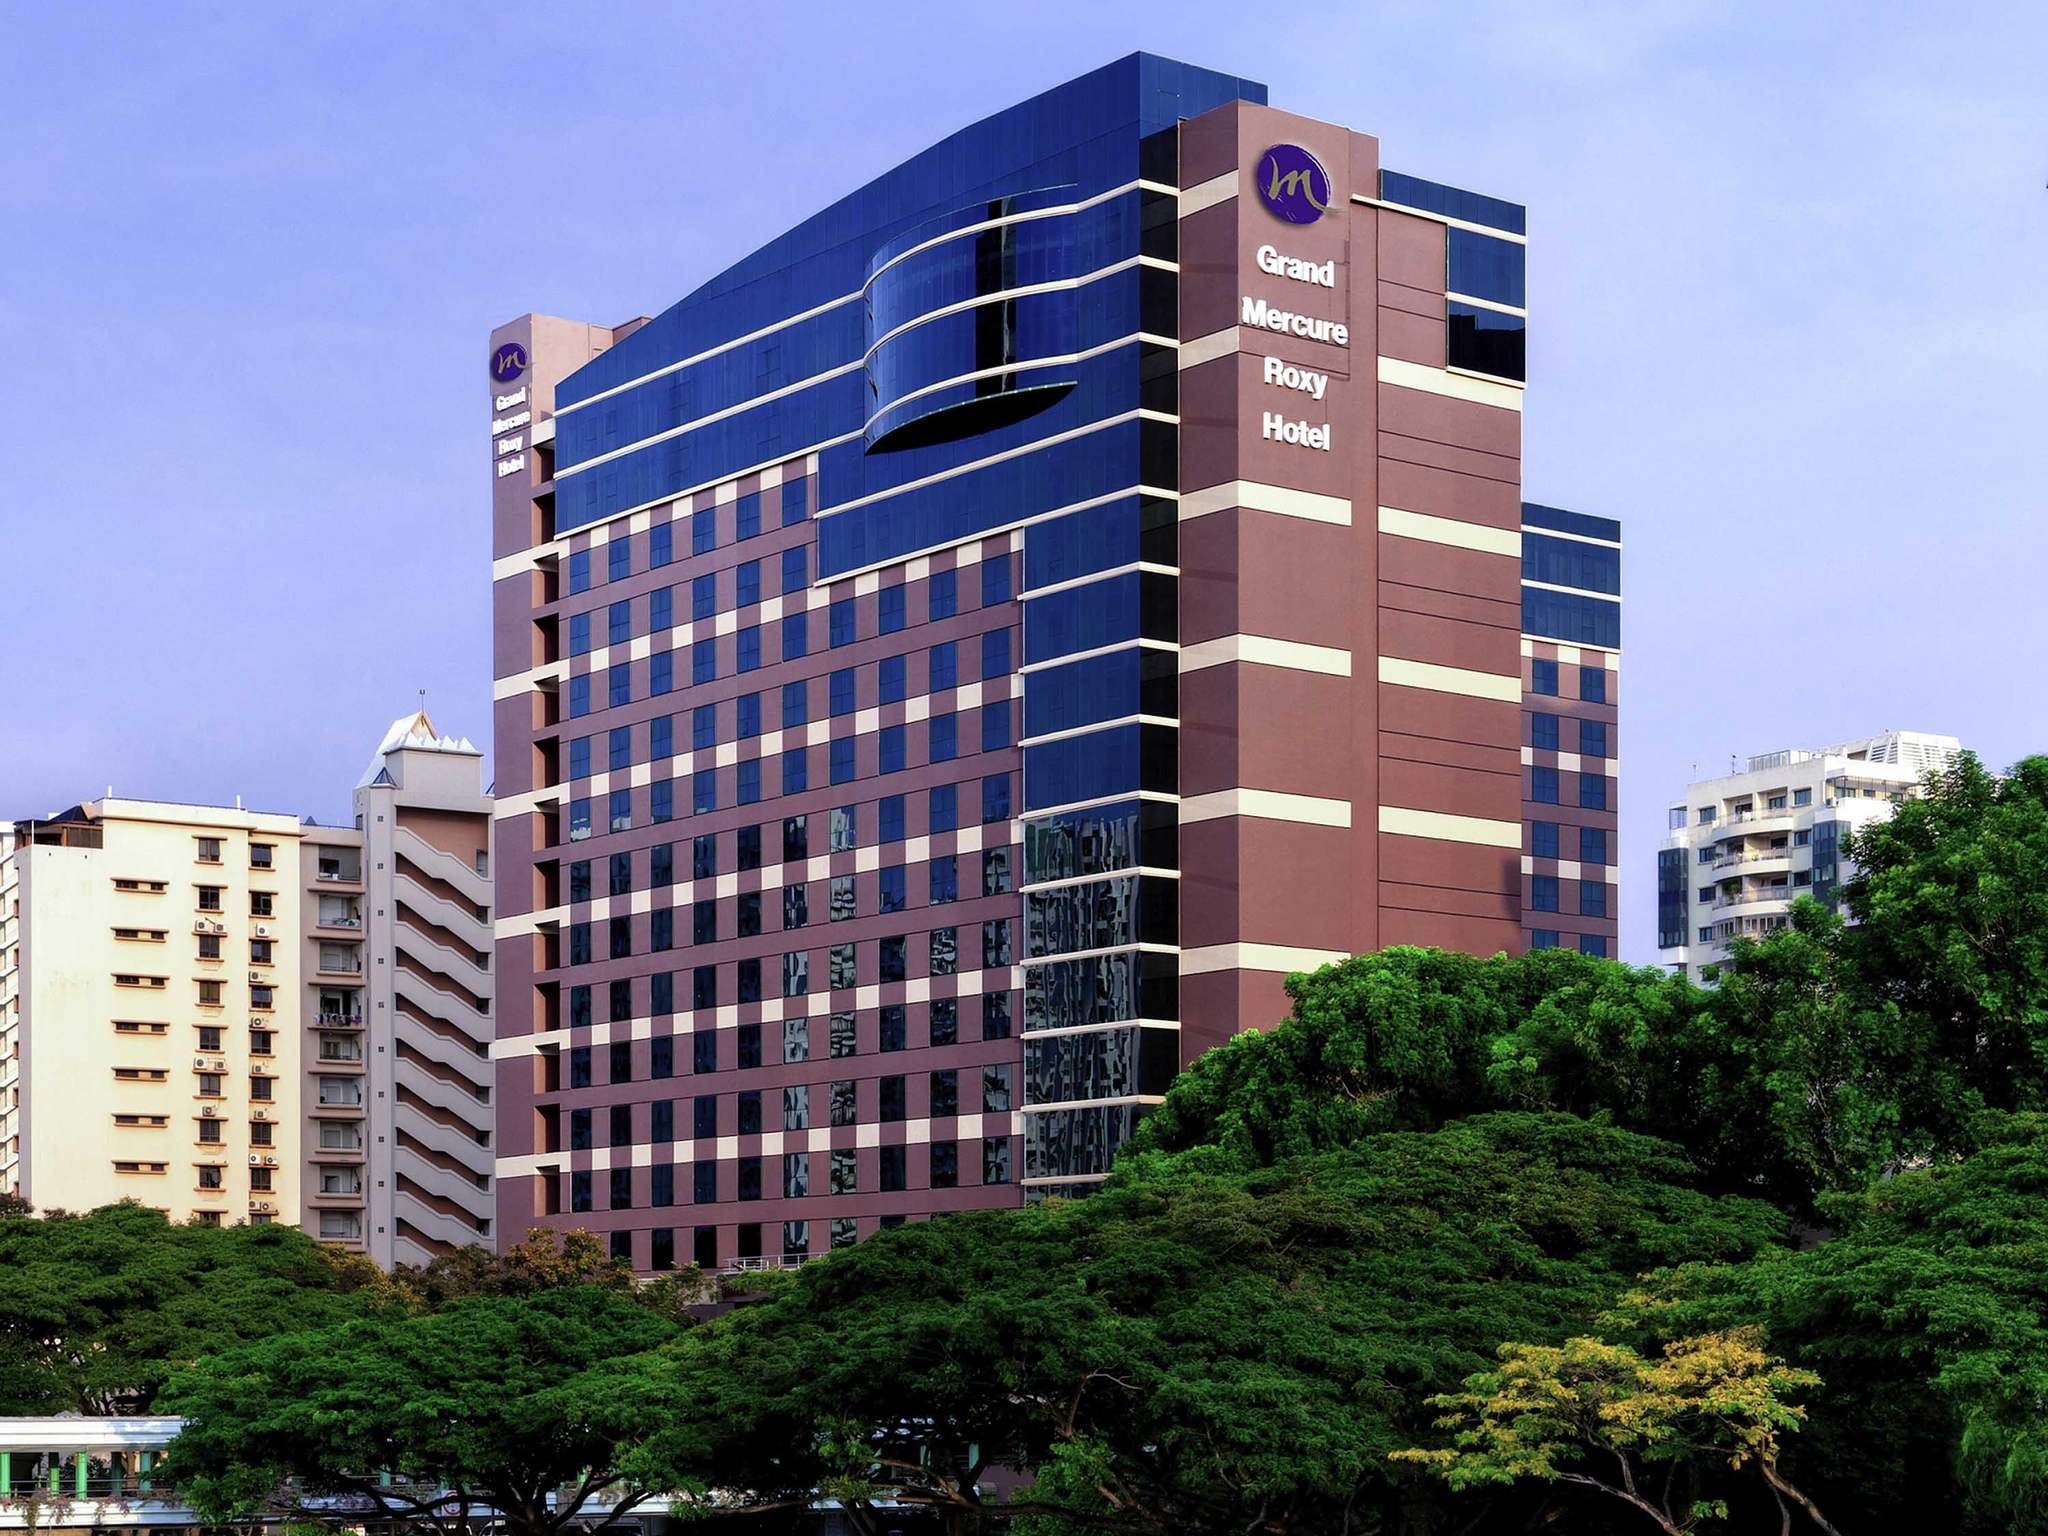 Hotel – Grand Mercure Singapore Roxy